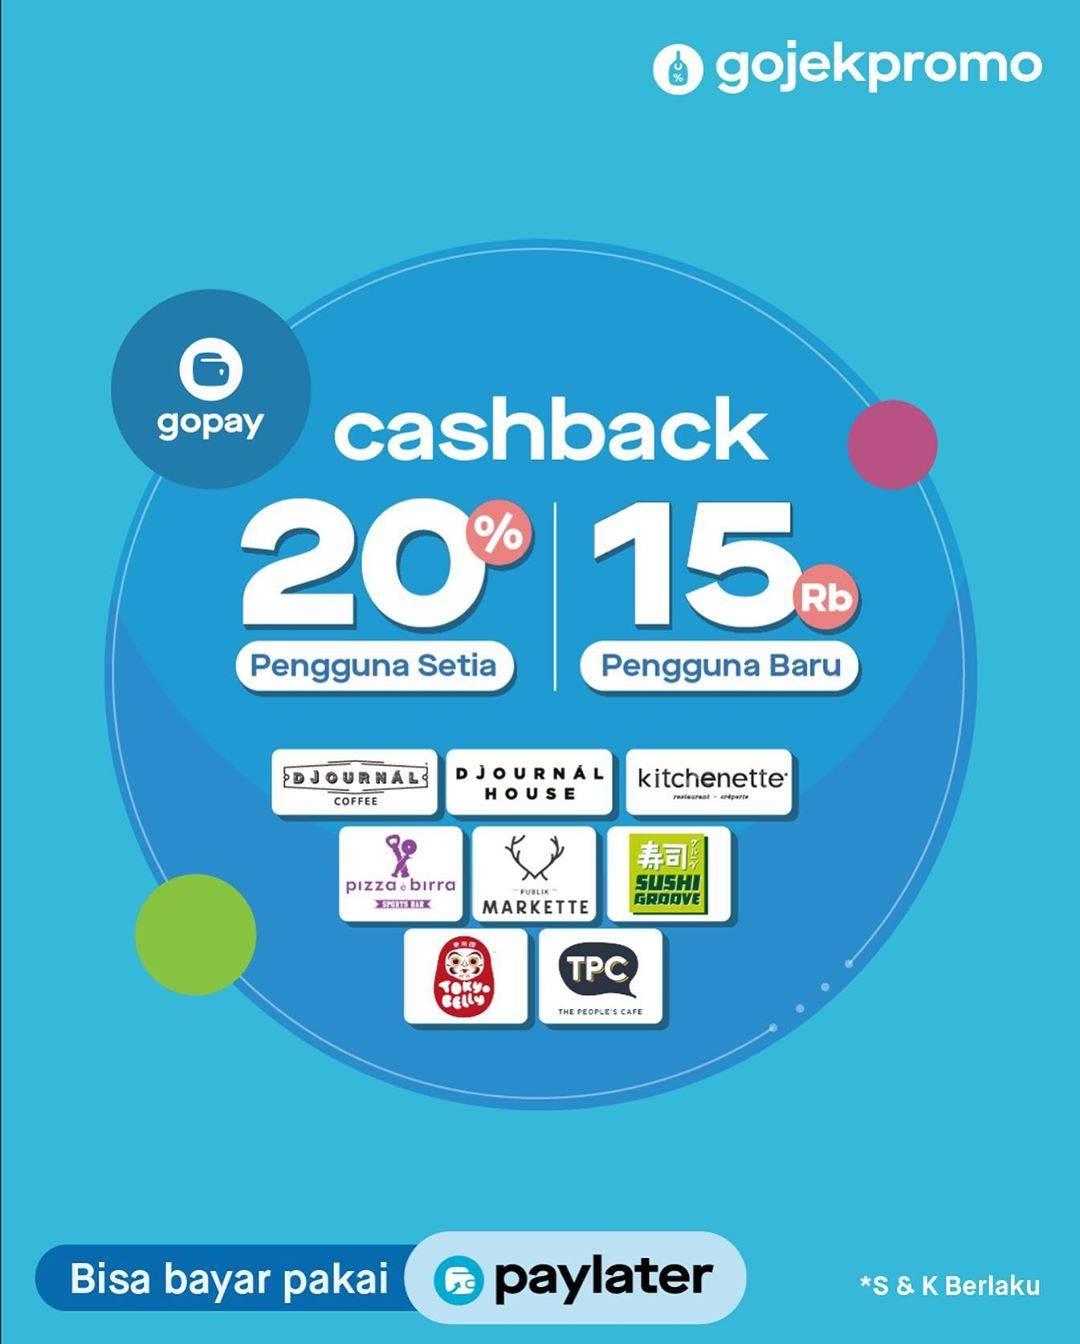 Gopay Cashback 20% Buat Pengguna Setia + 15Rb Pengguna Baru